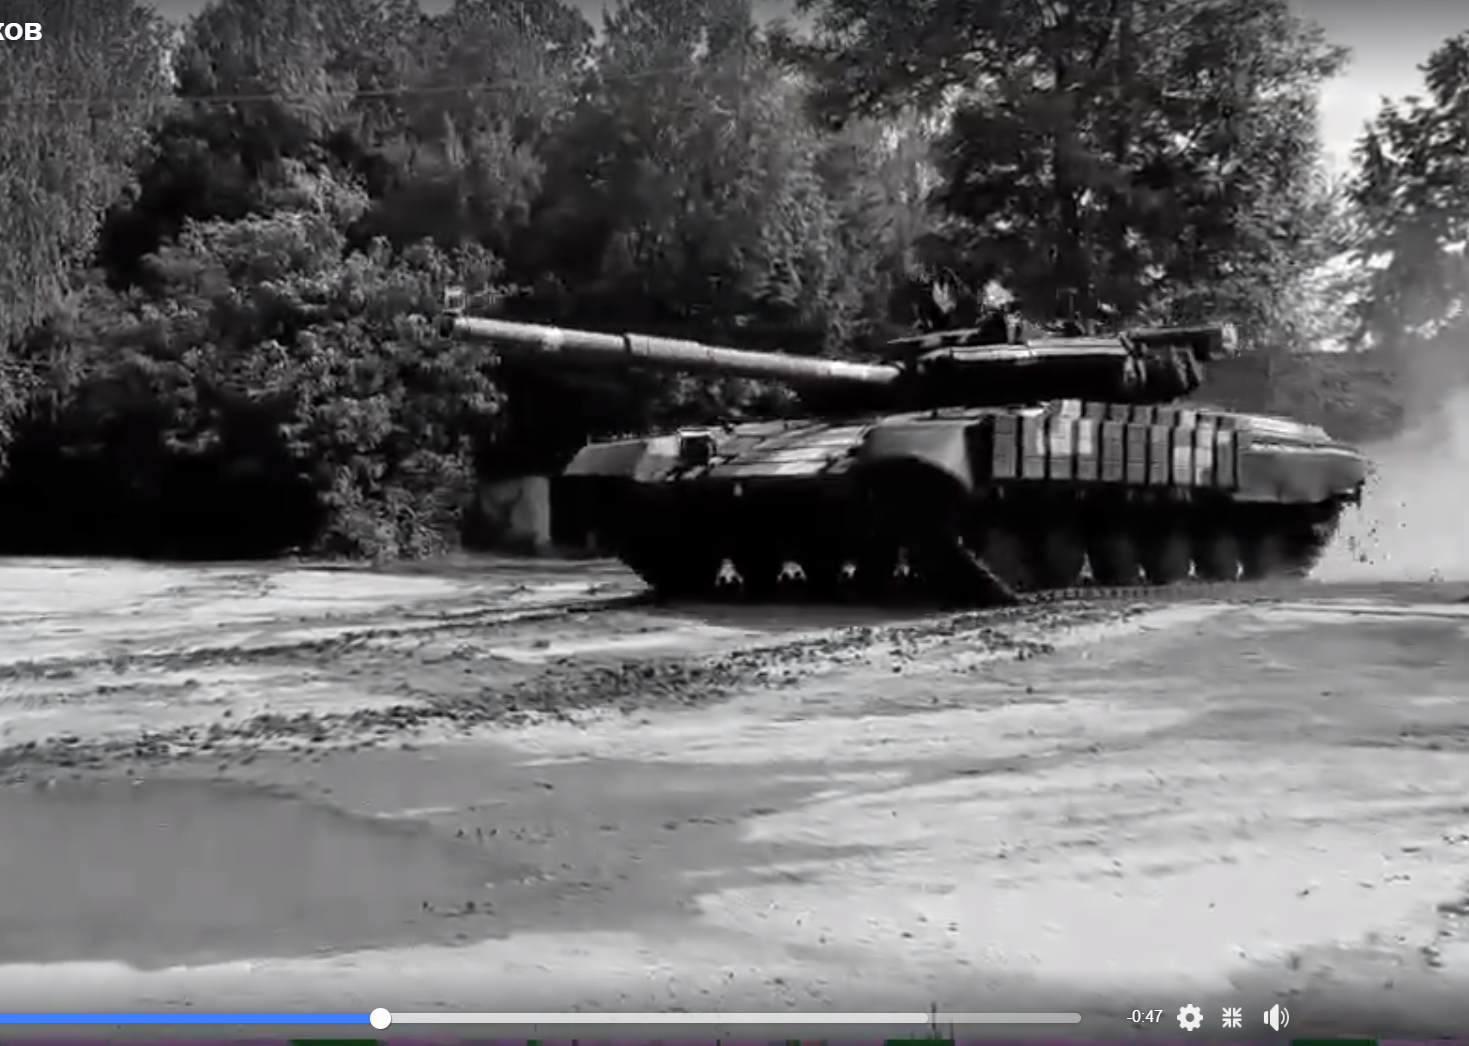 Украина, ВСУ, Армия, Танки, Т-64, Модернизация пиво пушка стабилизация